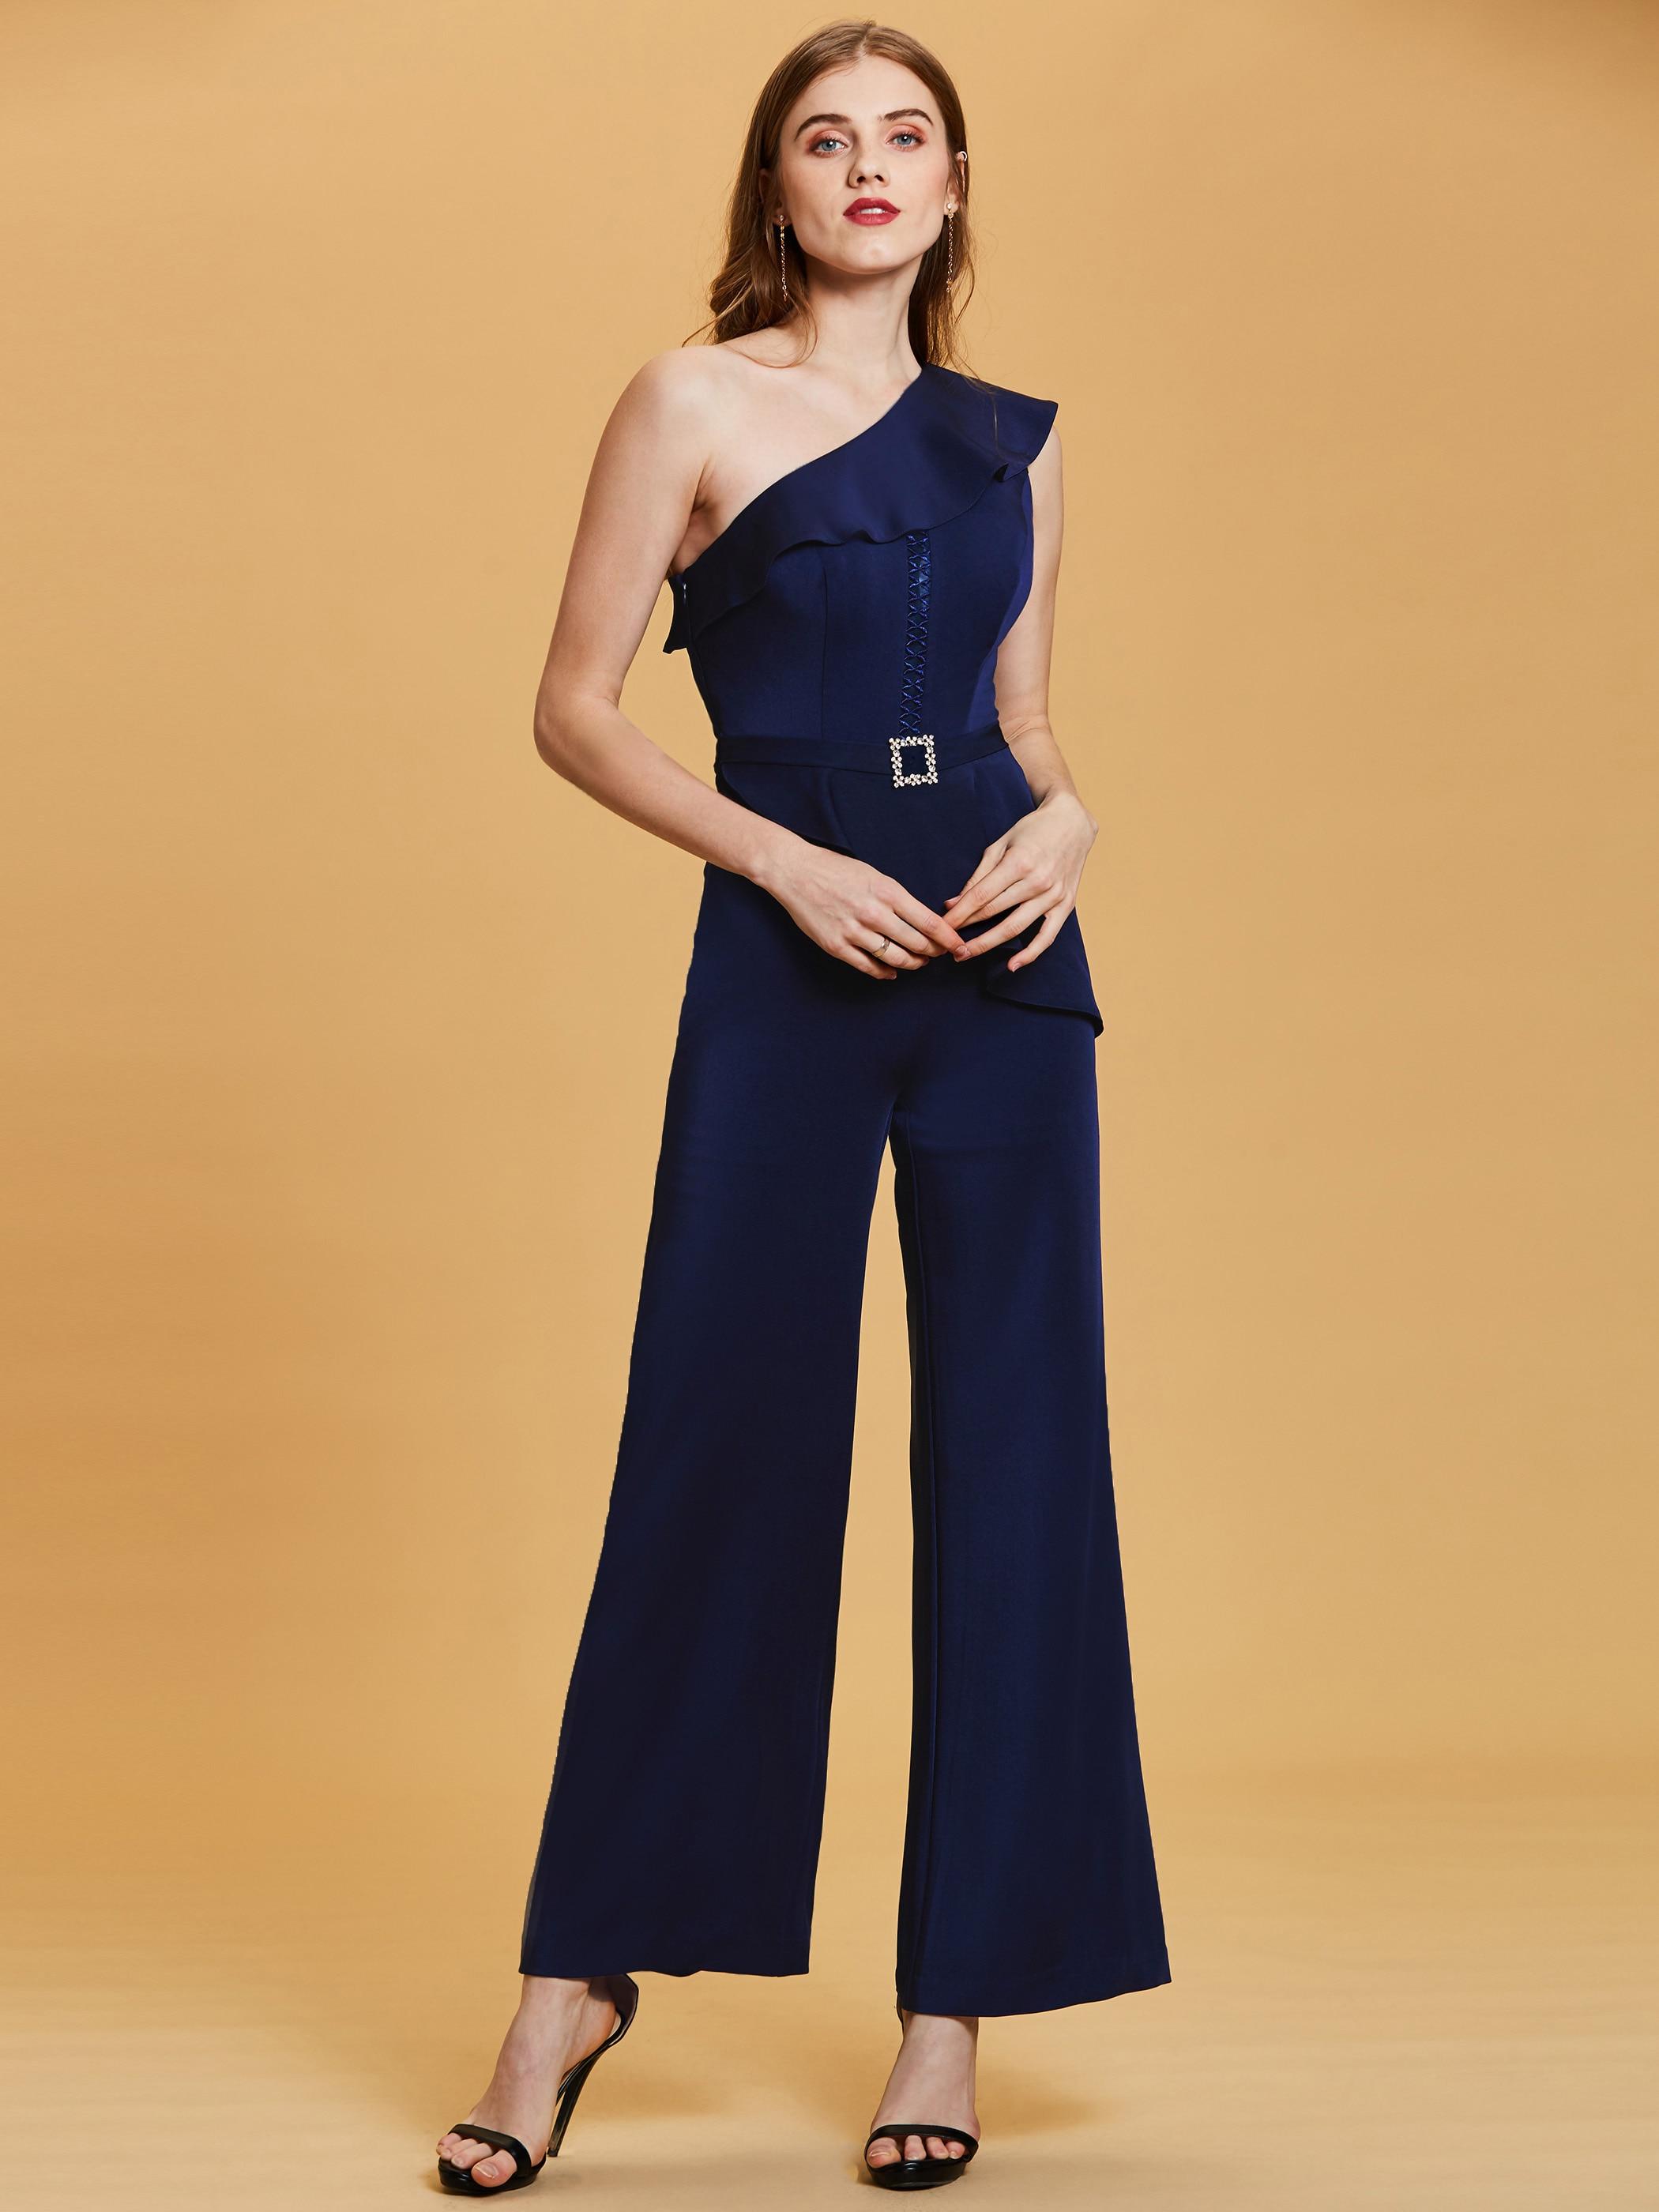 Ruffles One Shoulder Beading Women Jumpsuits Summer Women's Cloth Black Blue One Pieces Suit Elegant Formal Evening Dresses